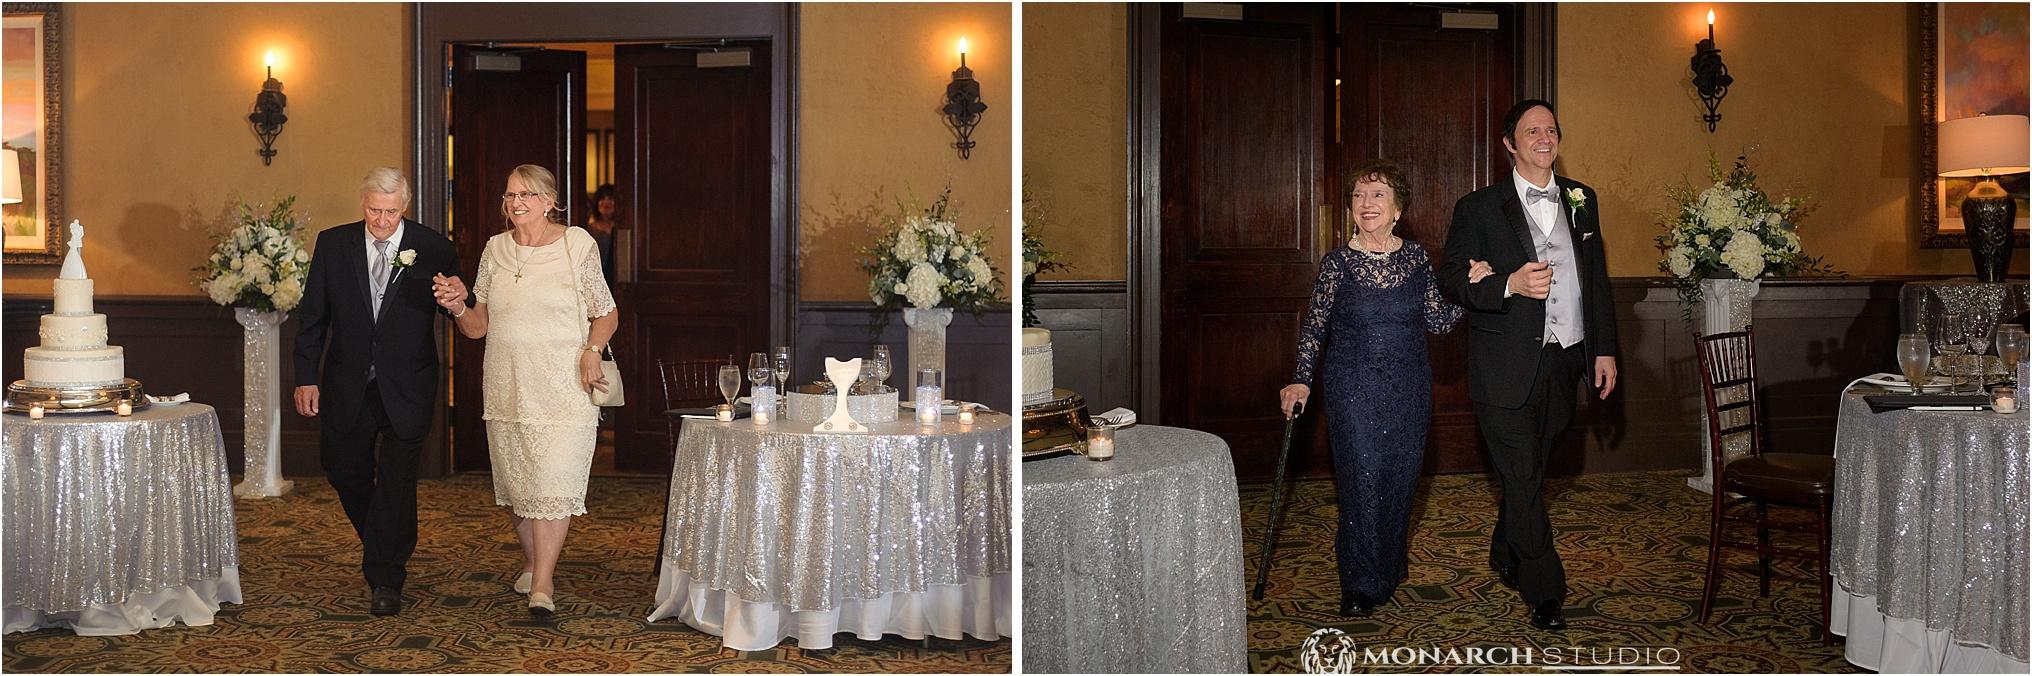 ponte-vedra-wedding-photographer-tpc095.jpg